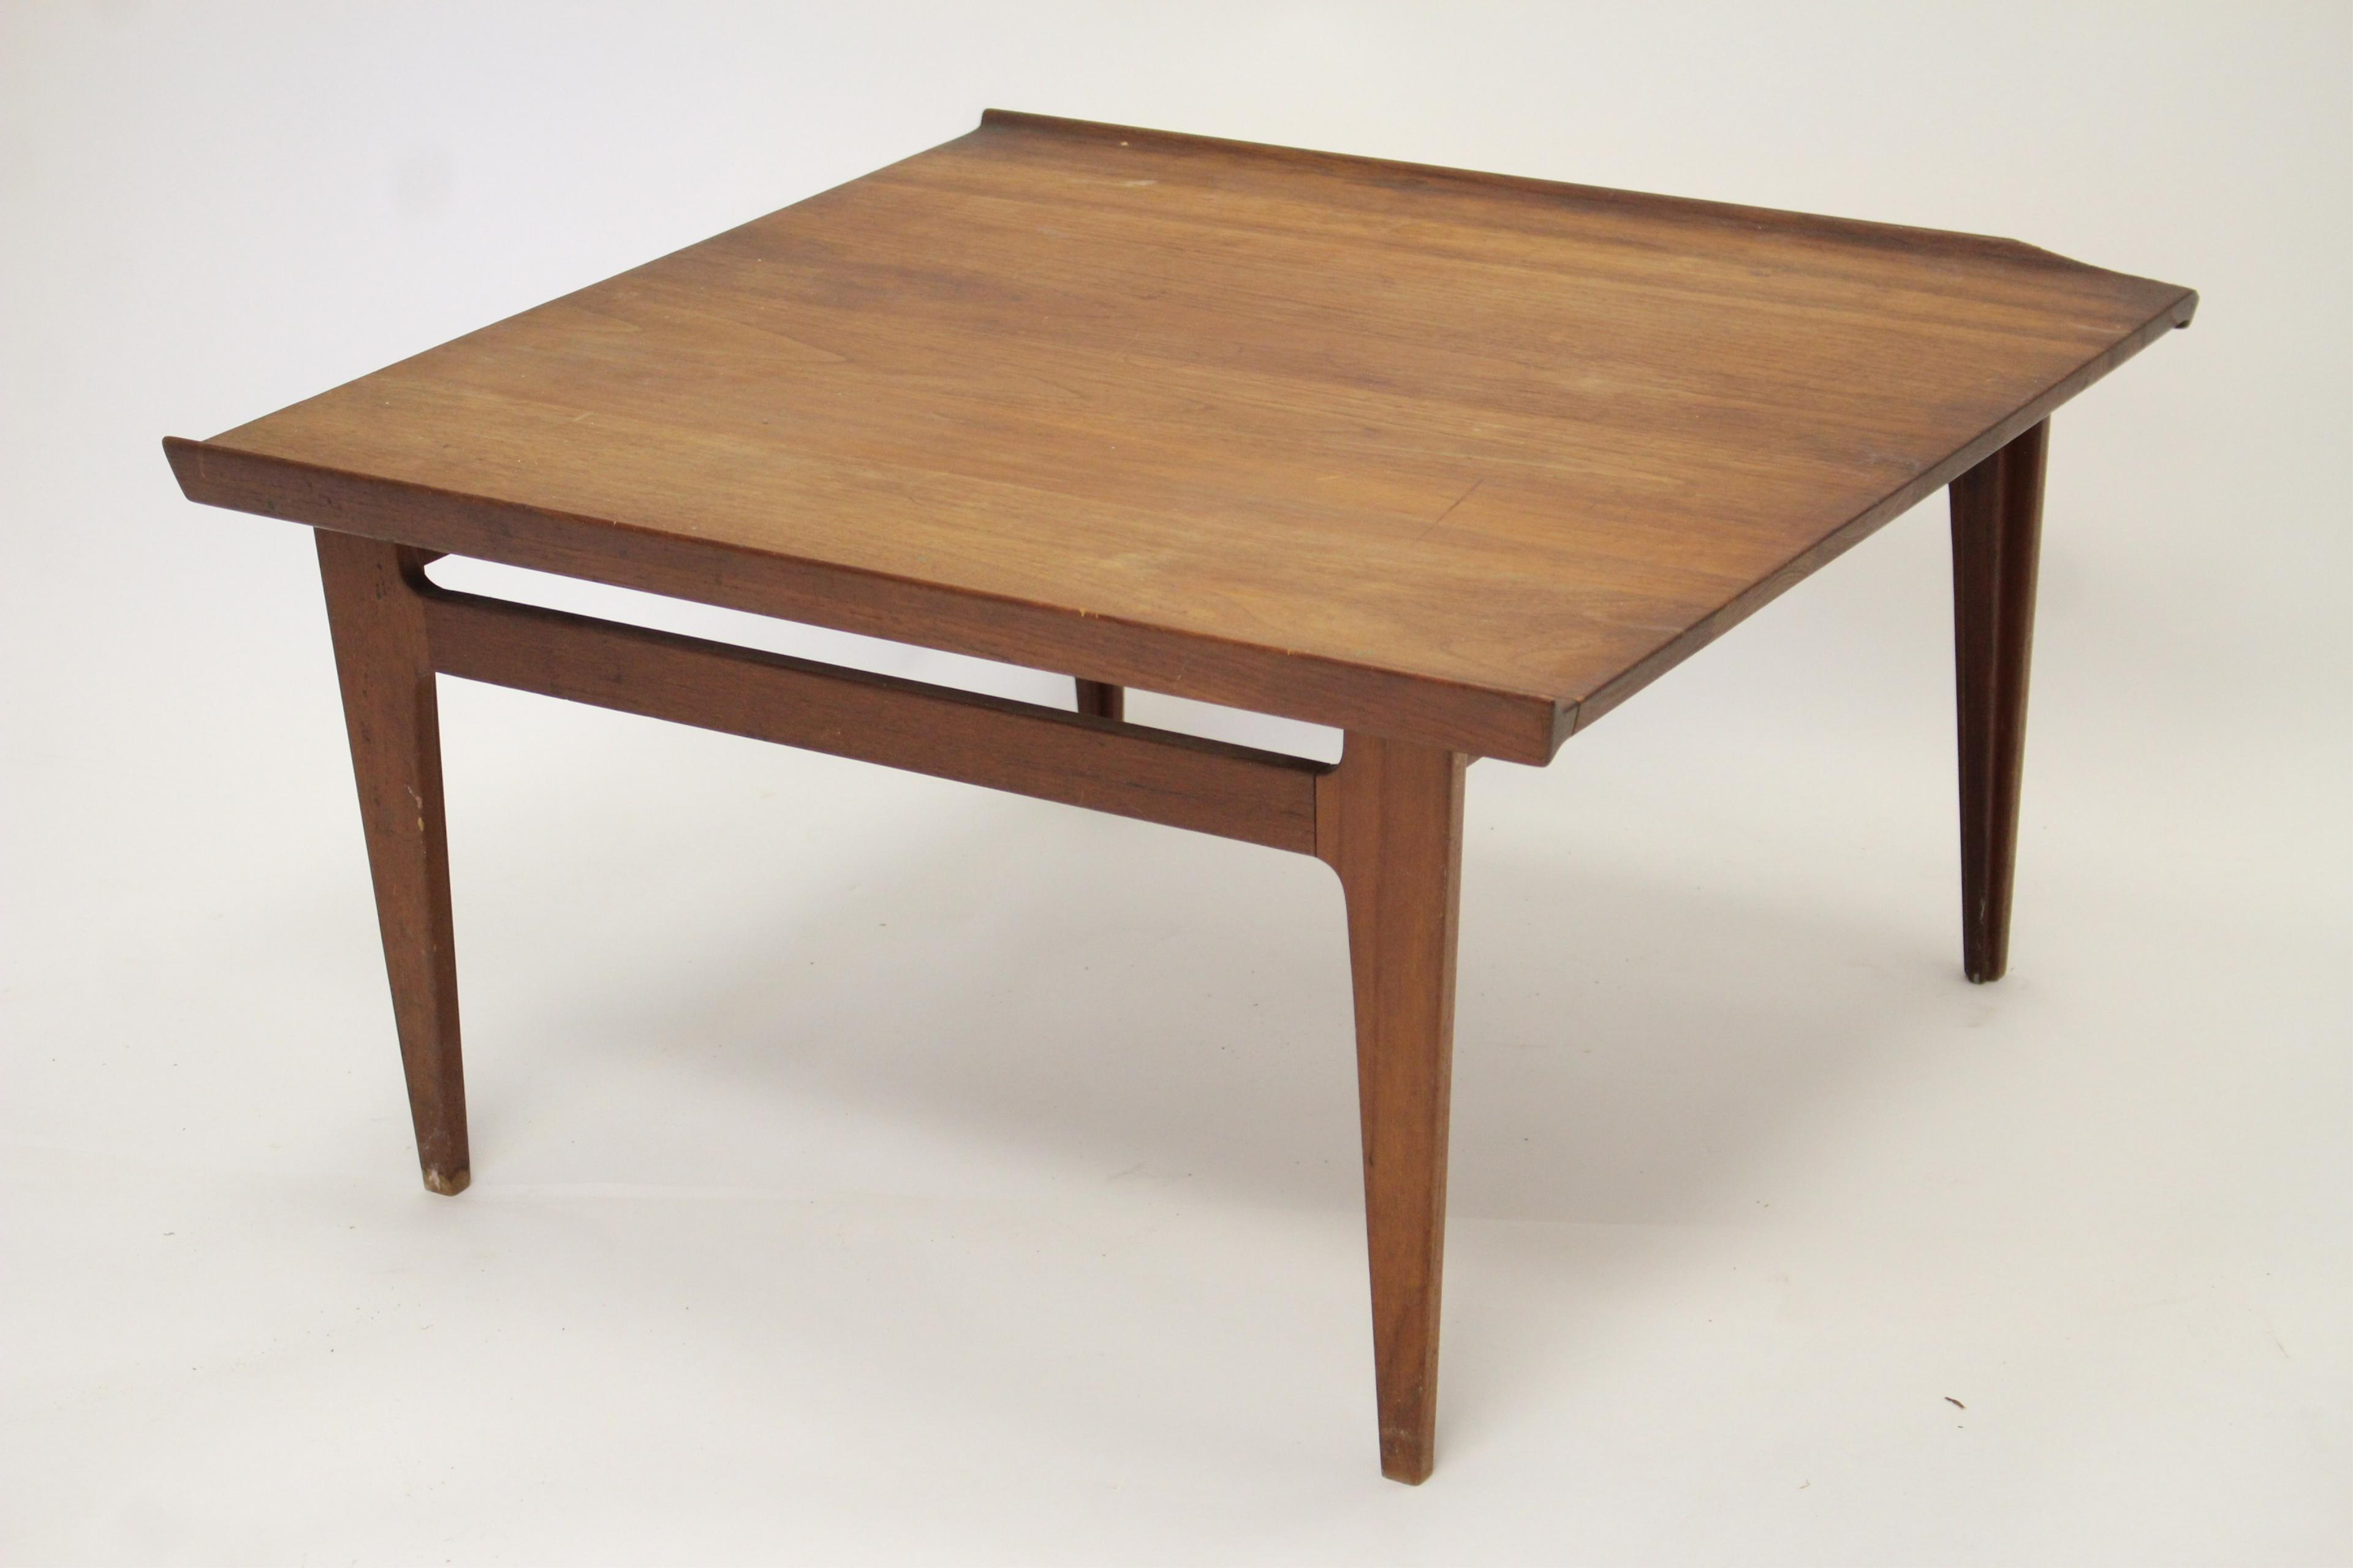 1105. Finn Juhl Teak Coffee Table For France 1958-59